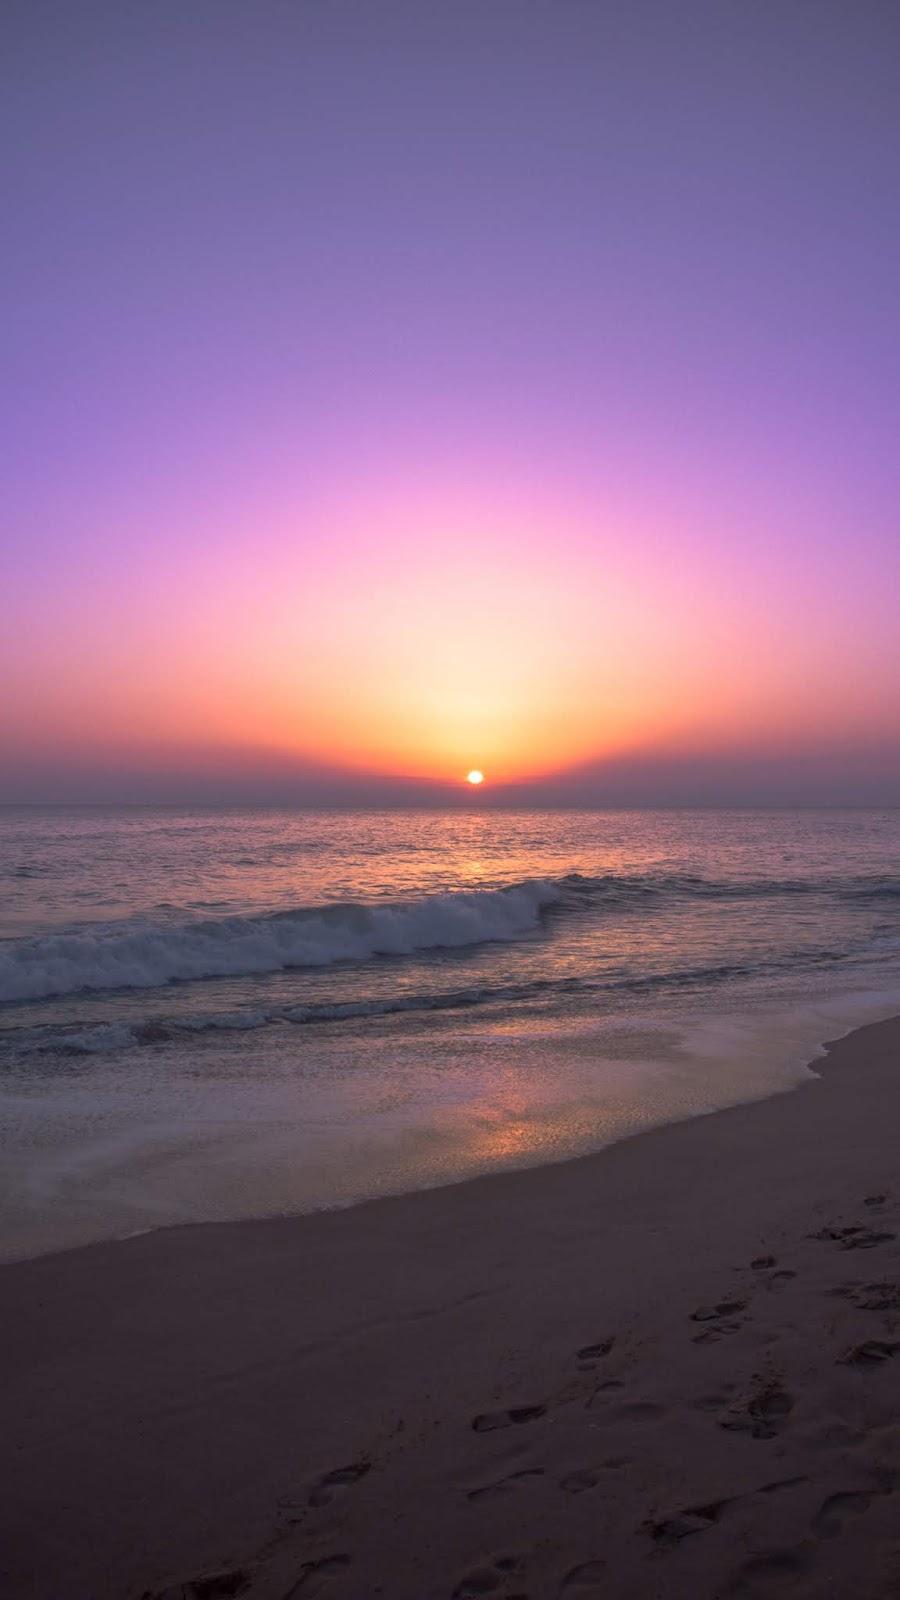 Twilight sunset